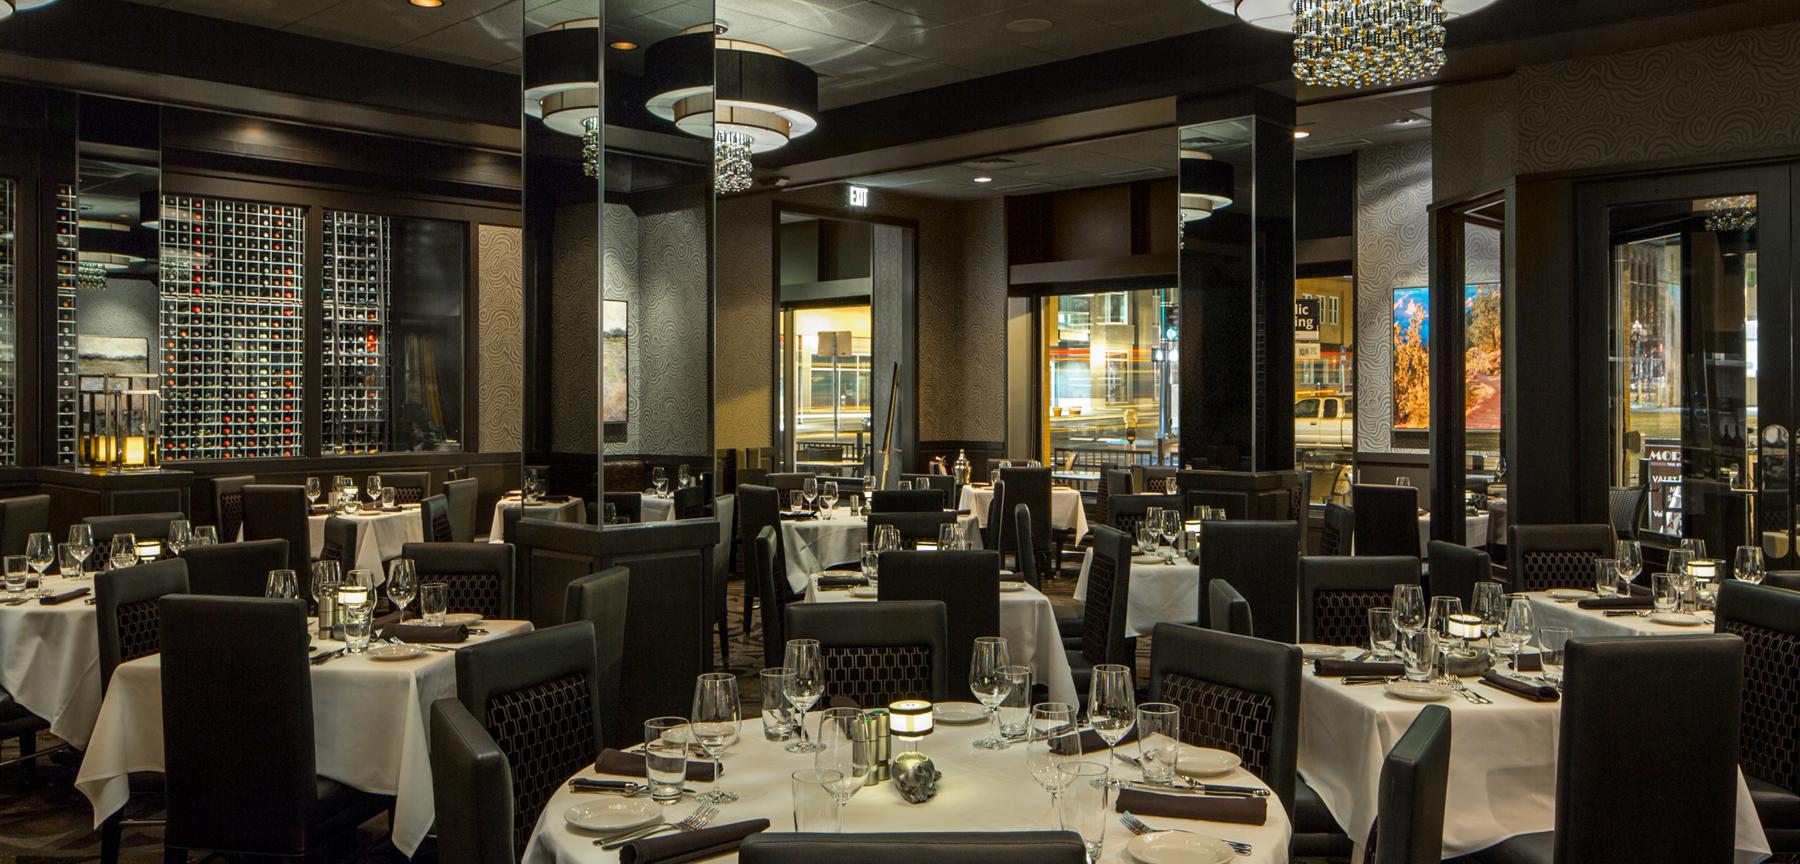 Morton's The Steakhouse in Denver - dining area